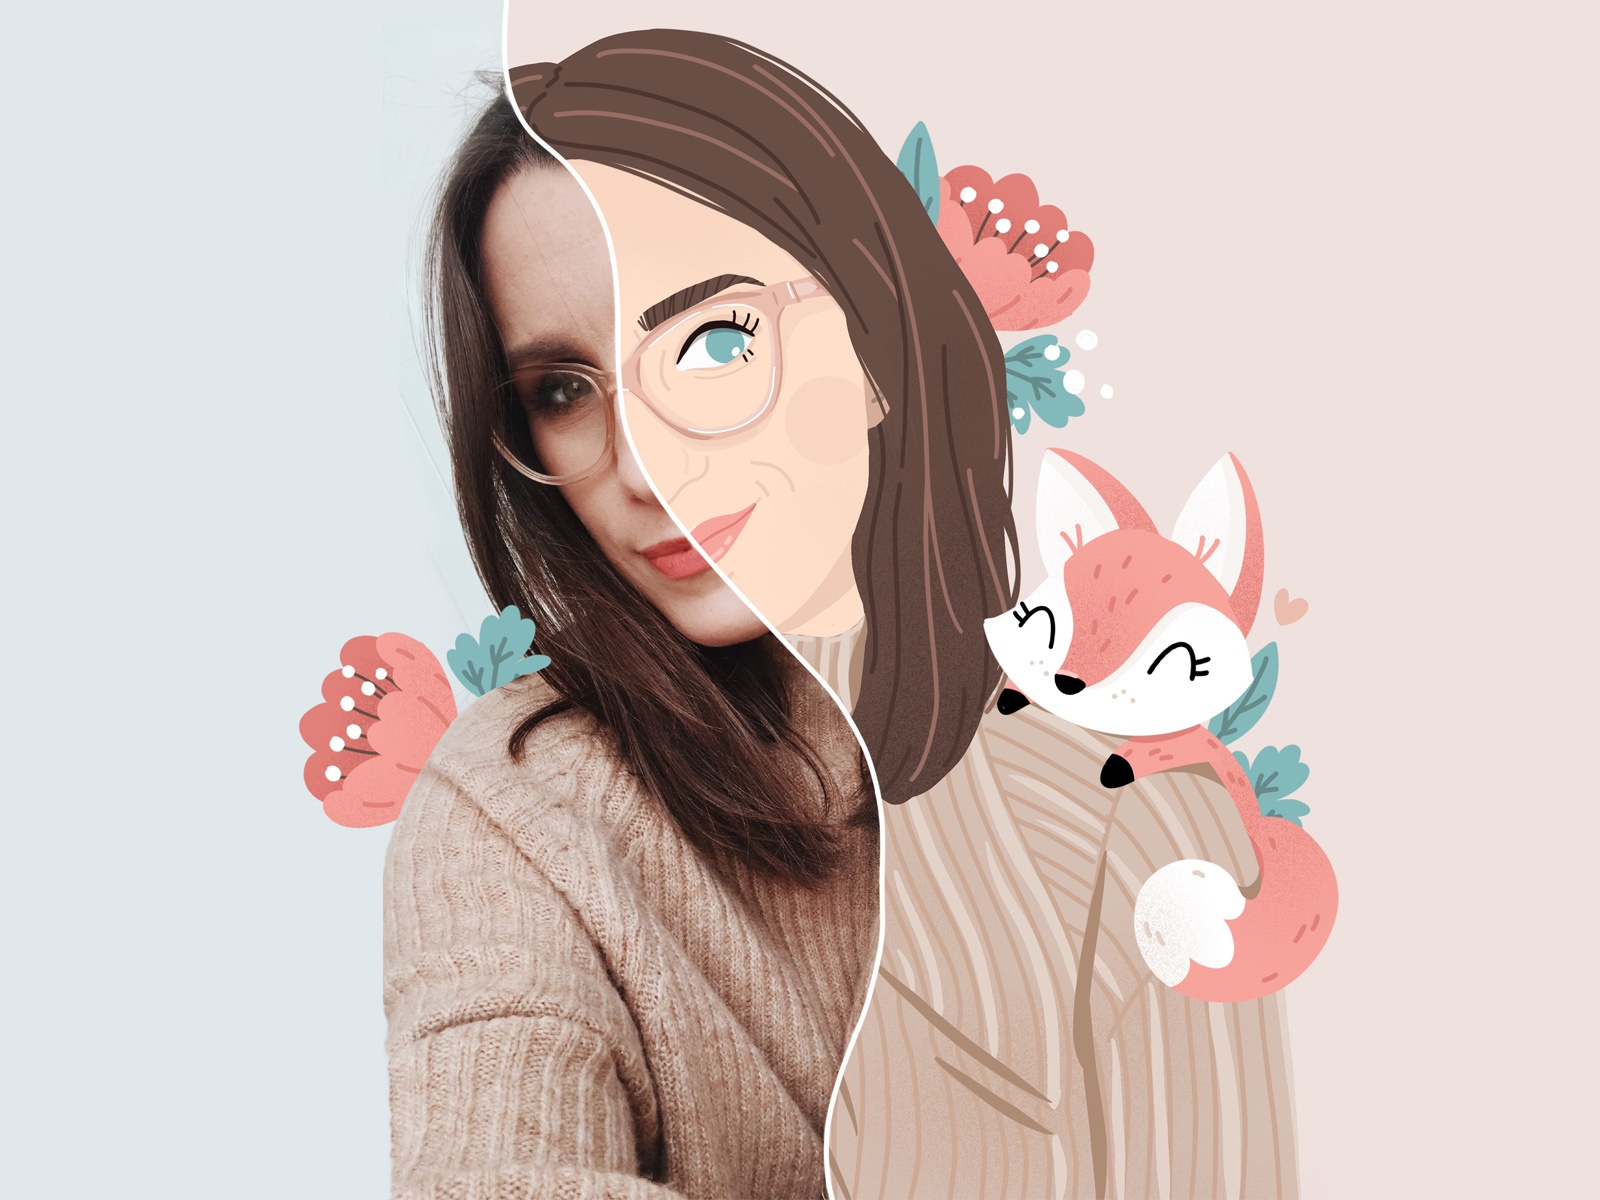 Toonme Challenge by Ewa Brzozowska on Dribbble